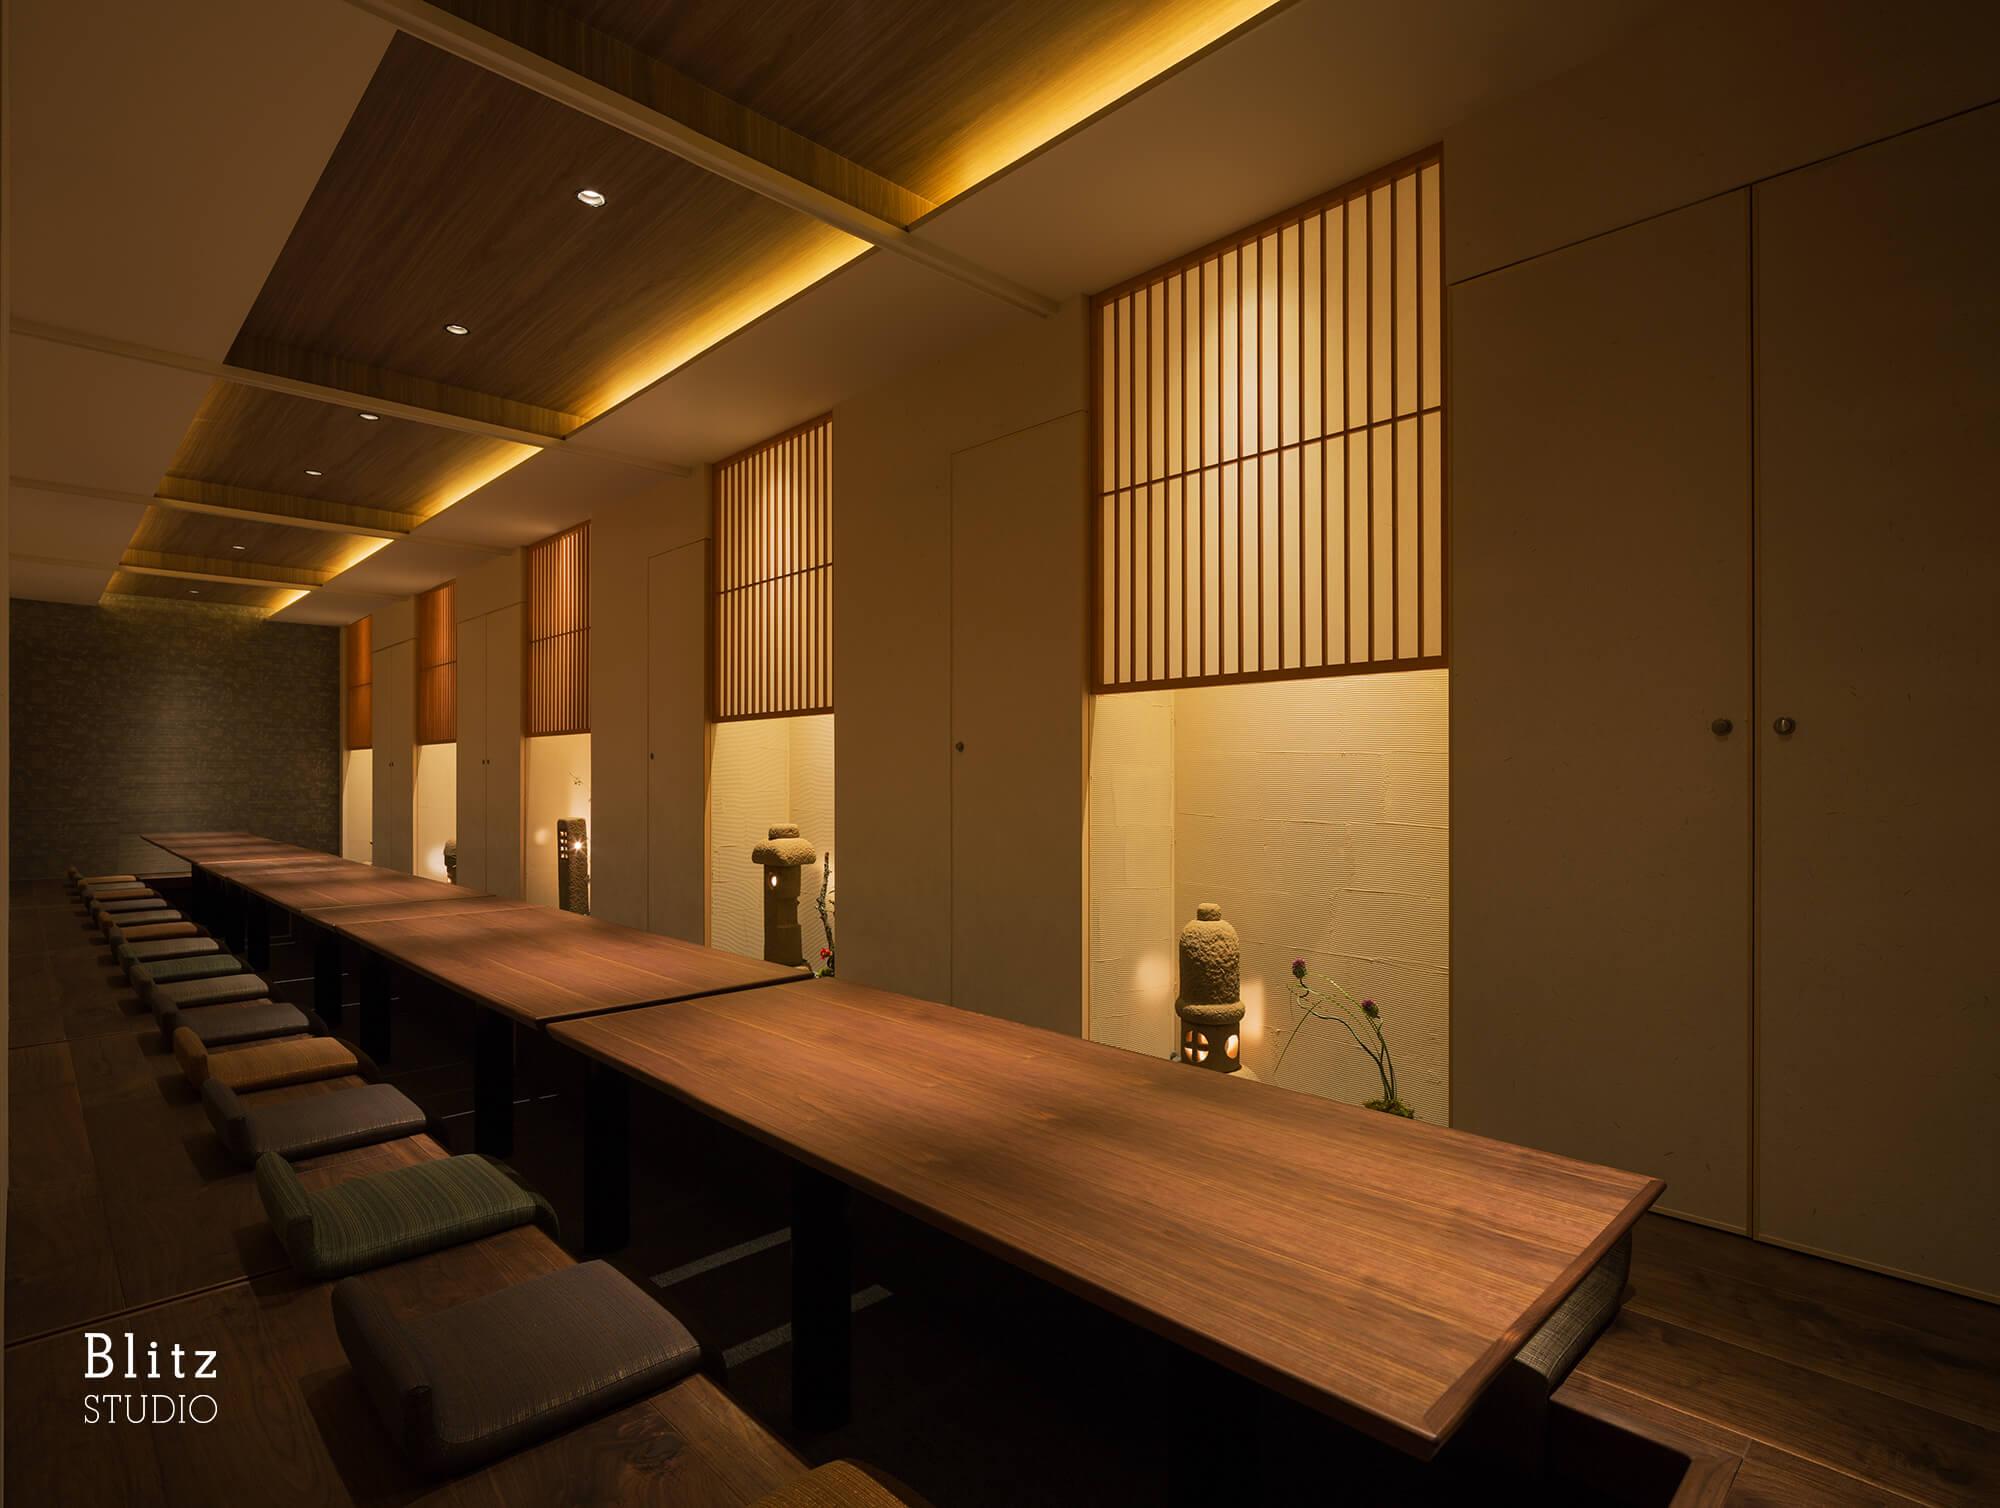 『Dining Bar Mond 2nd / 主水』建築写真・竣工写真・インテリア写真7